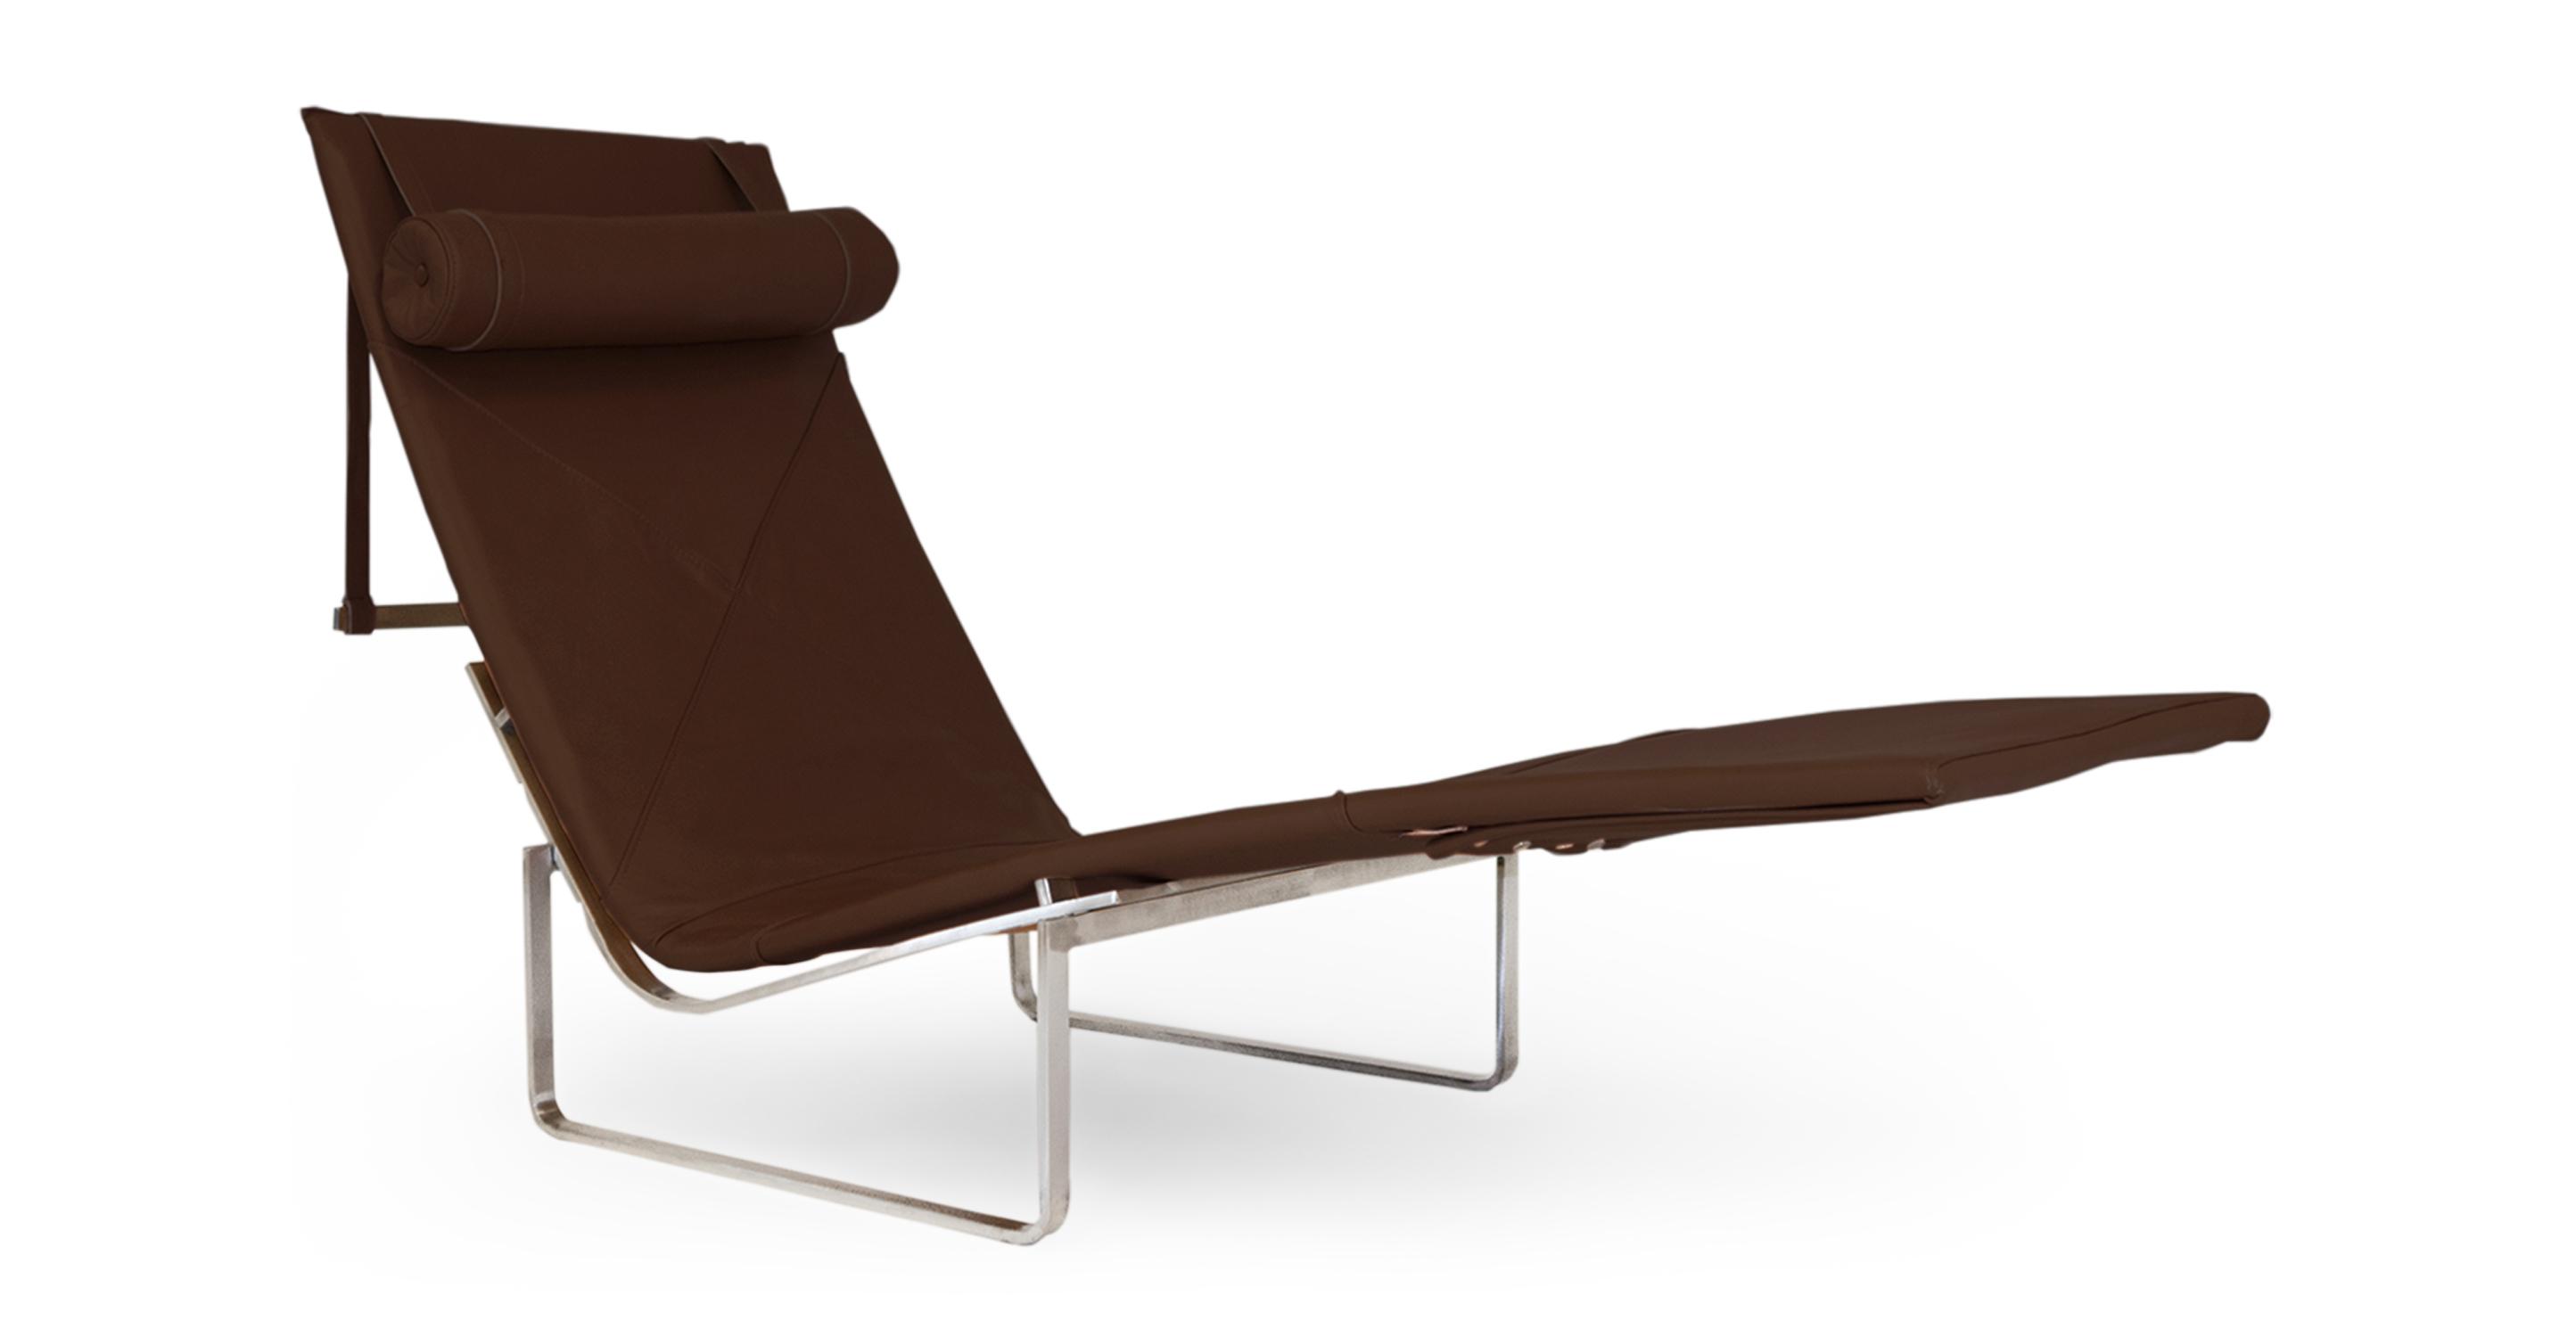 Kardiel PK24 Modern Chaise Lounge Chair, Coco Brown Anili...